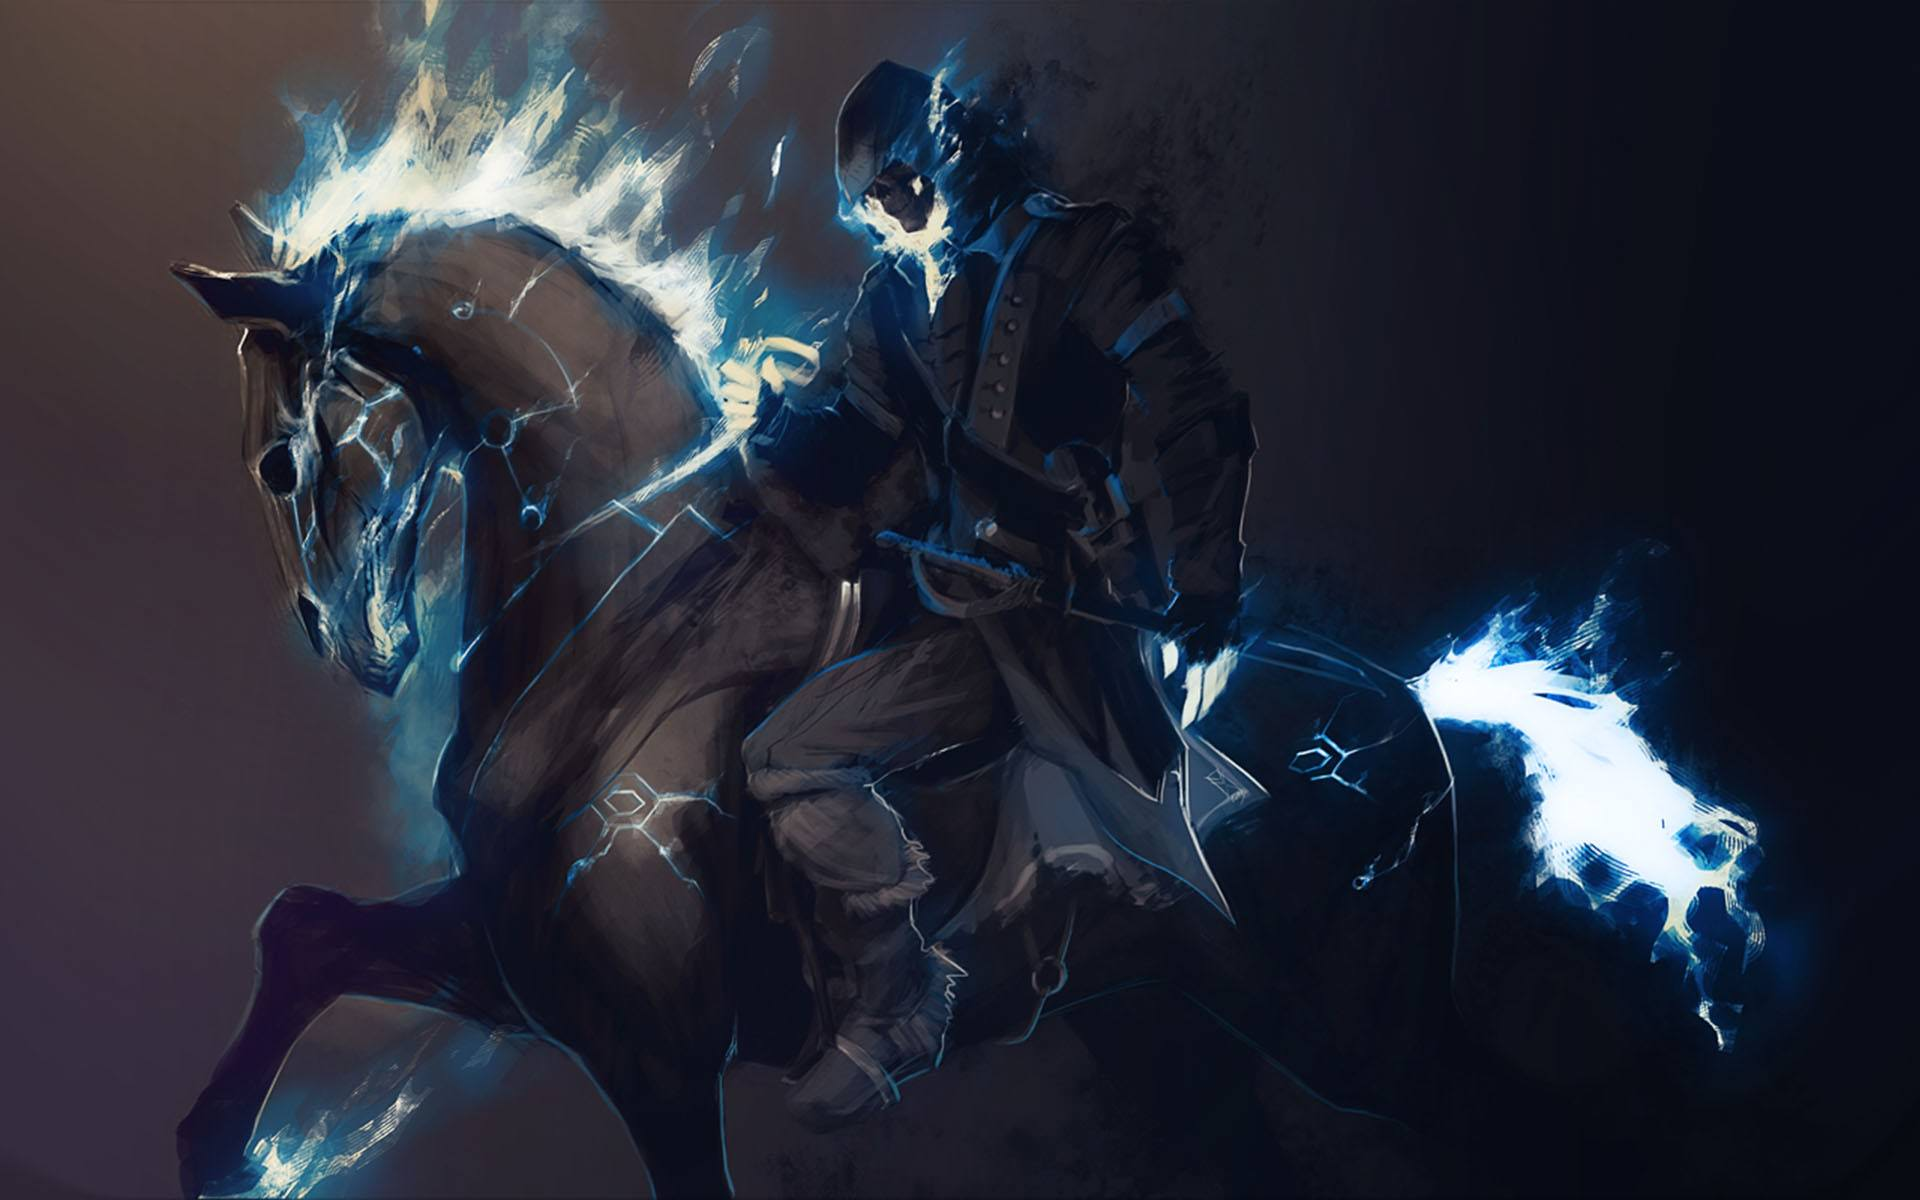 download wallpaper horse fantasy painting digital fire 1920x1200